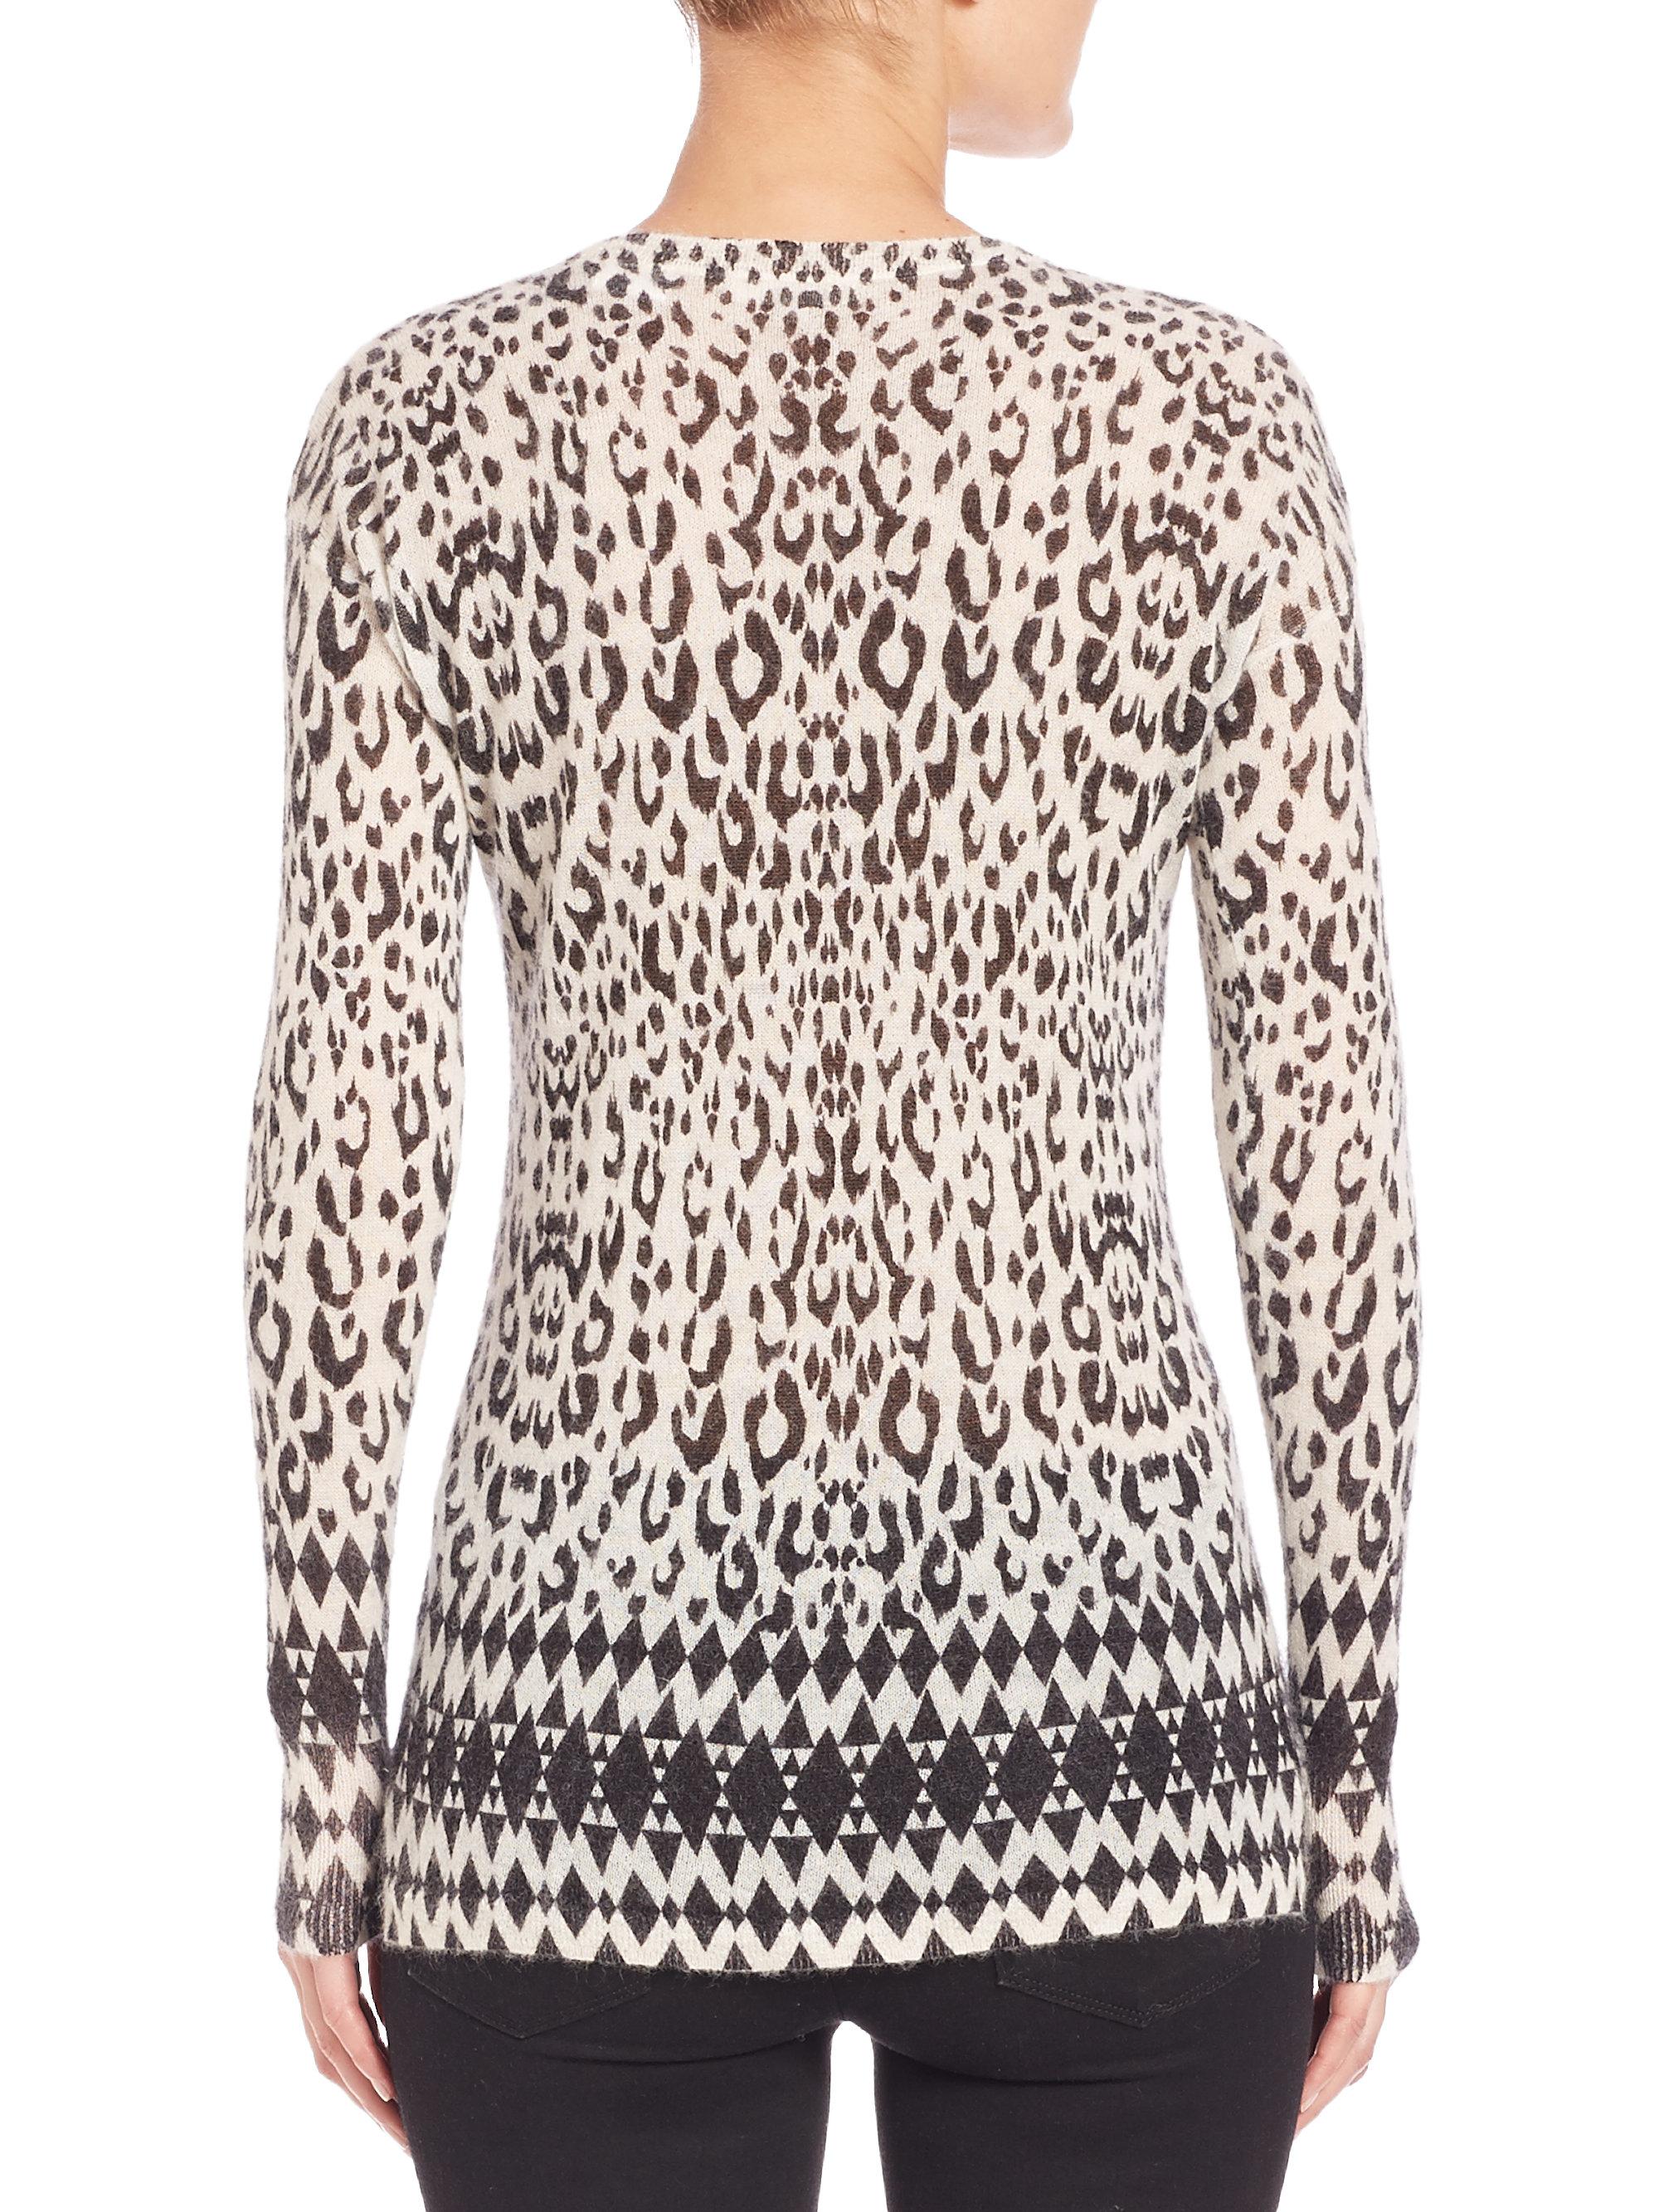 Rebecca taylor Leopard-print Sweater in Black | Lyst